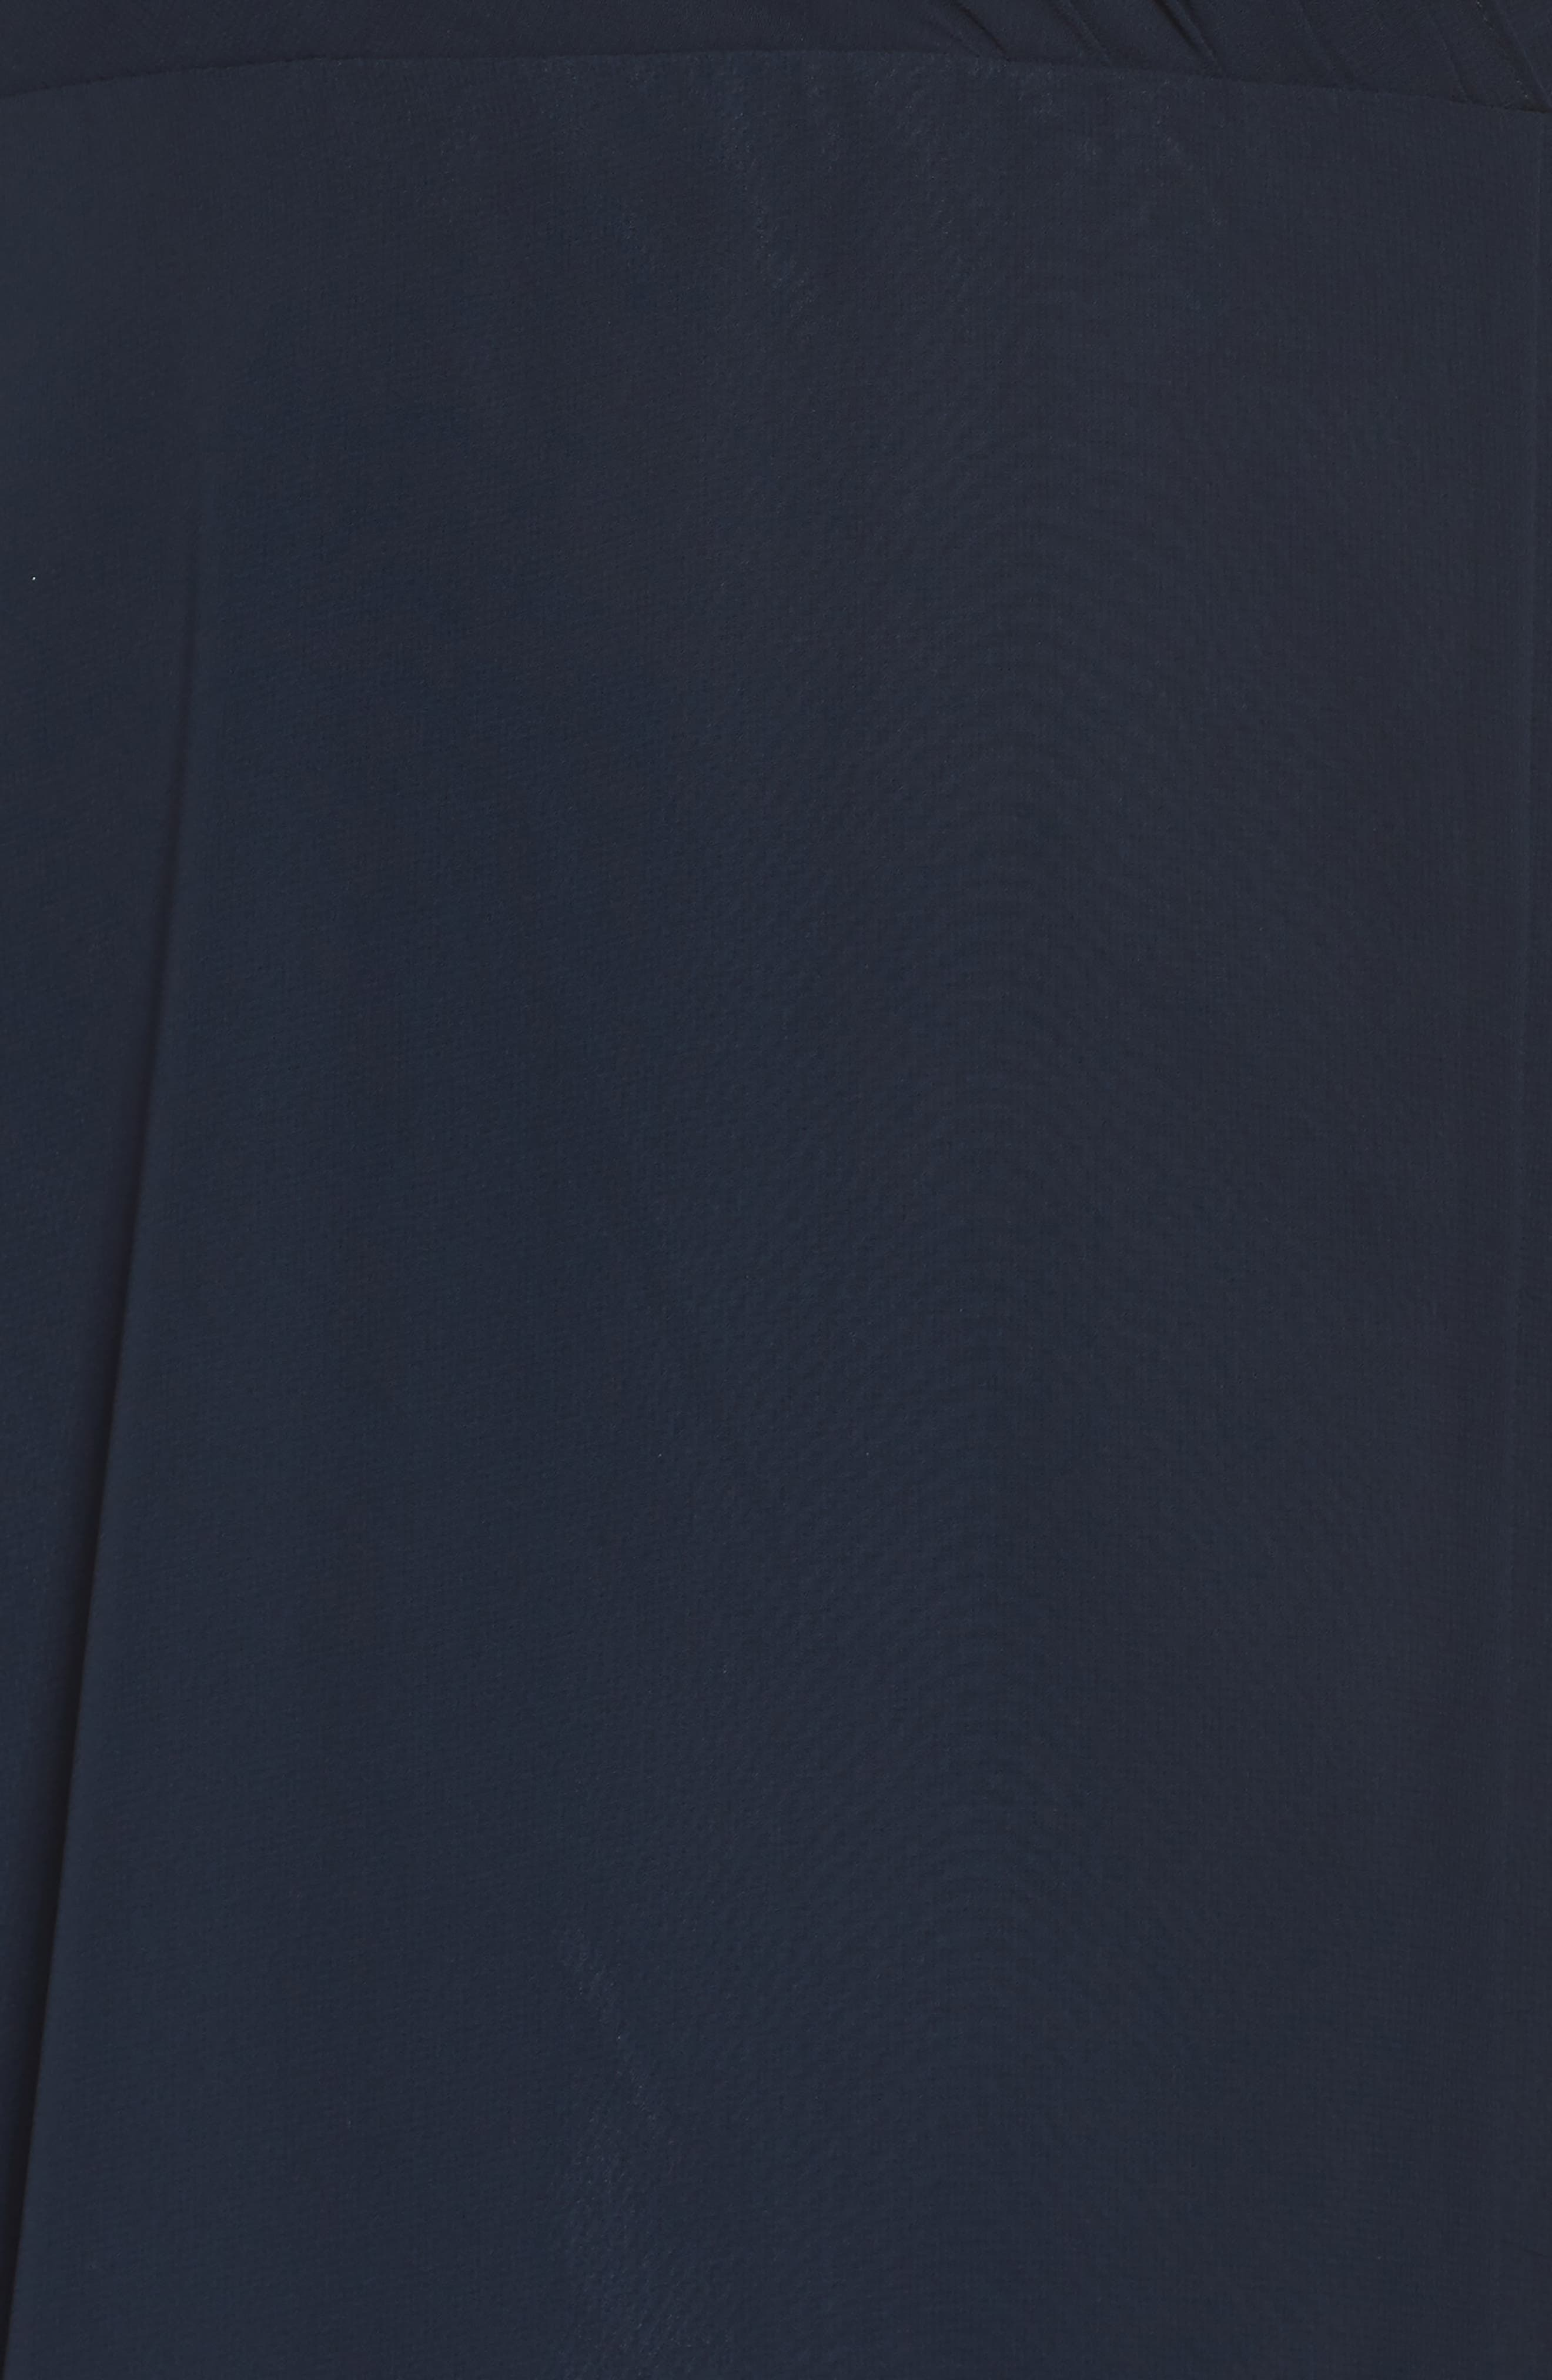 Alanna Open Back Chiffon Gown,                             Alternate thumbnail 5, color,                             Navy